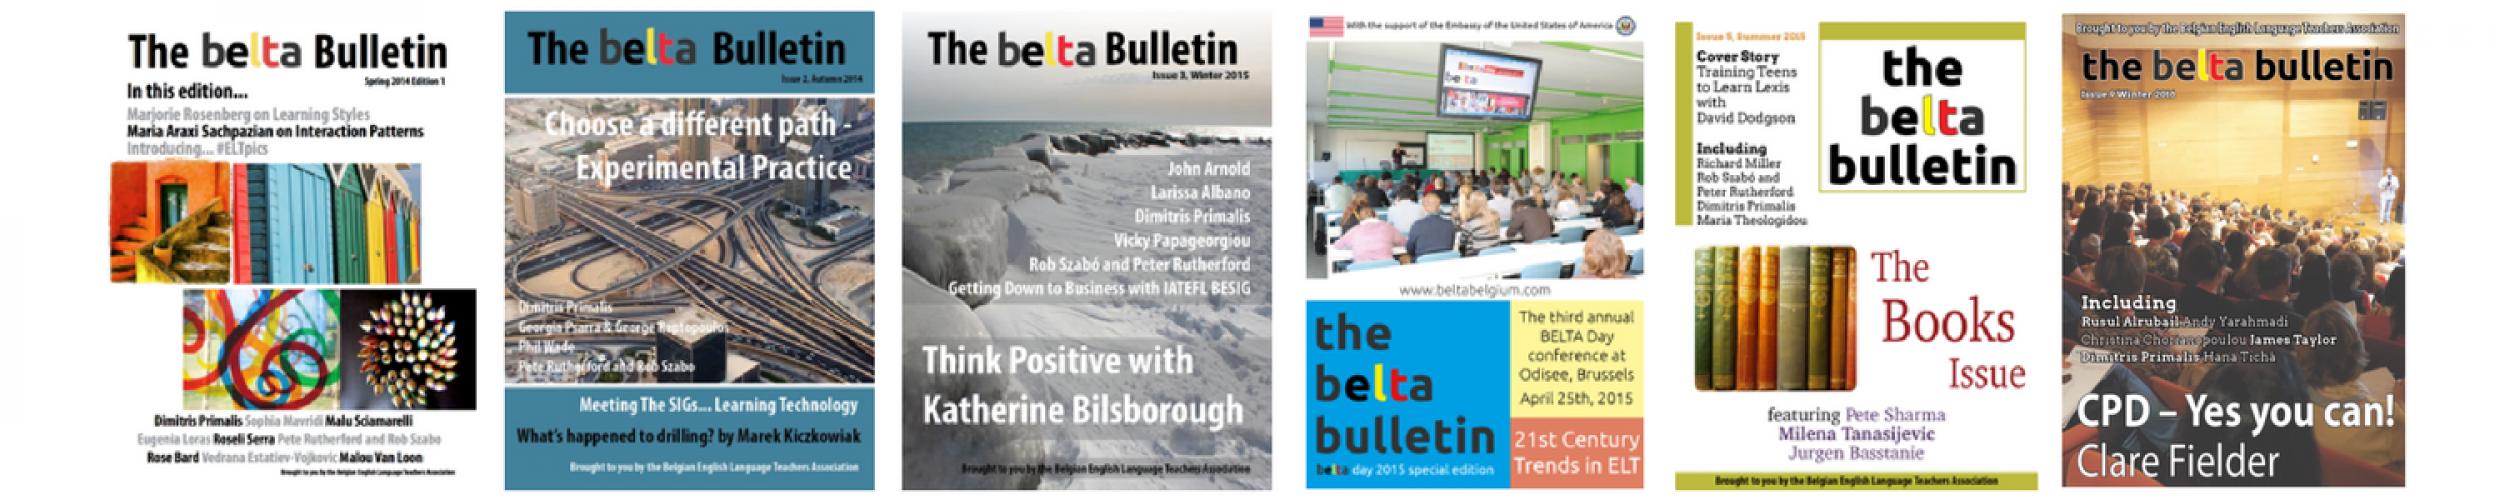 The BELTA Bulletin